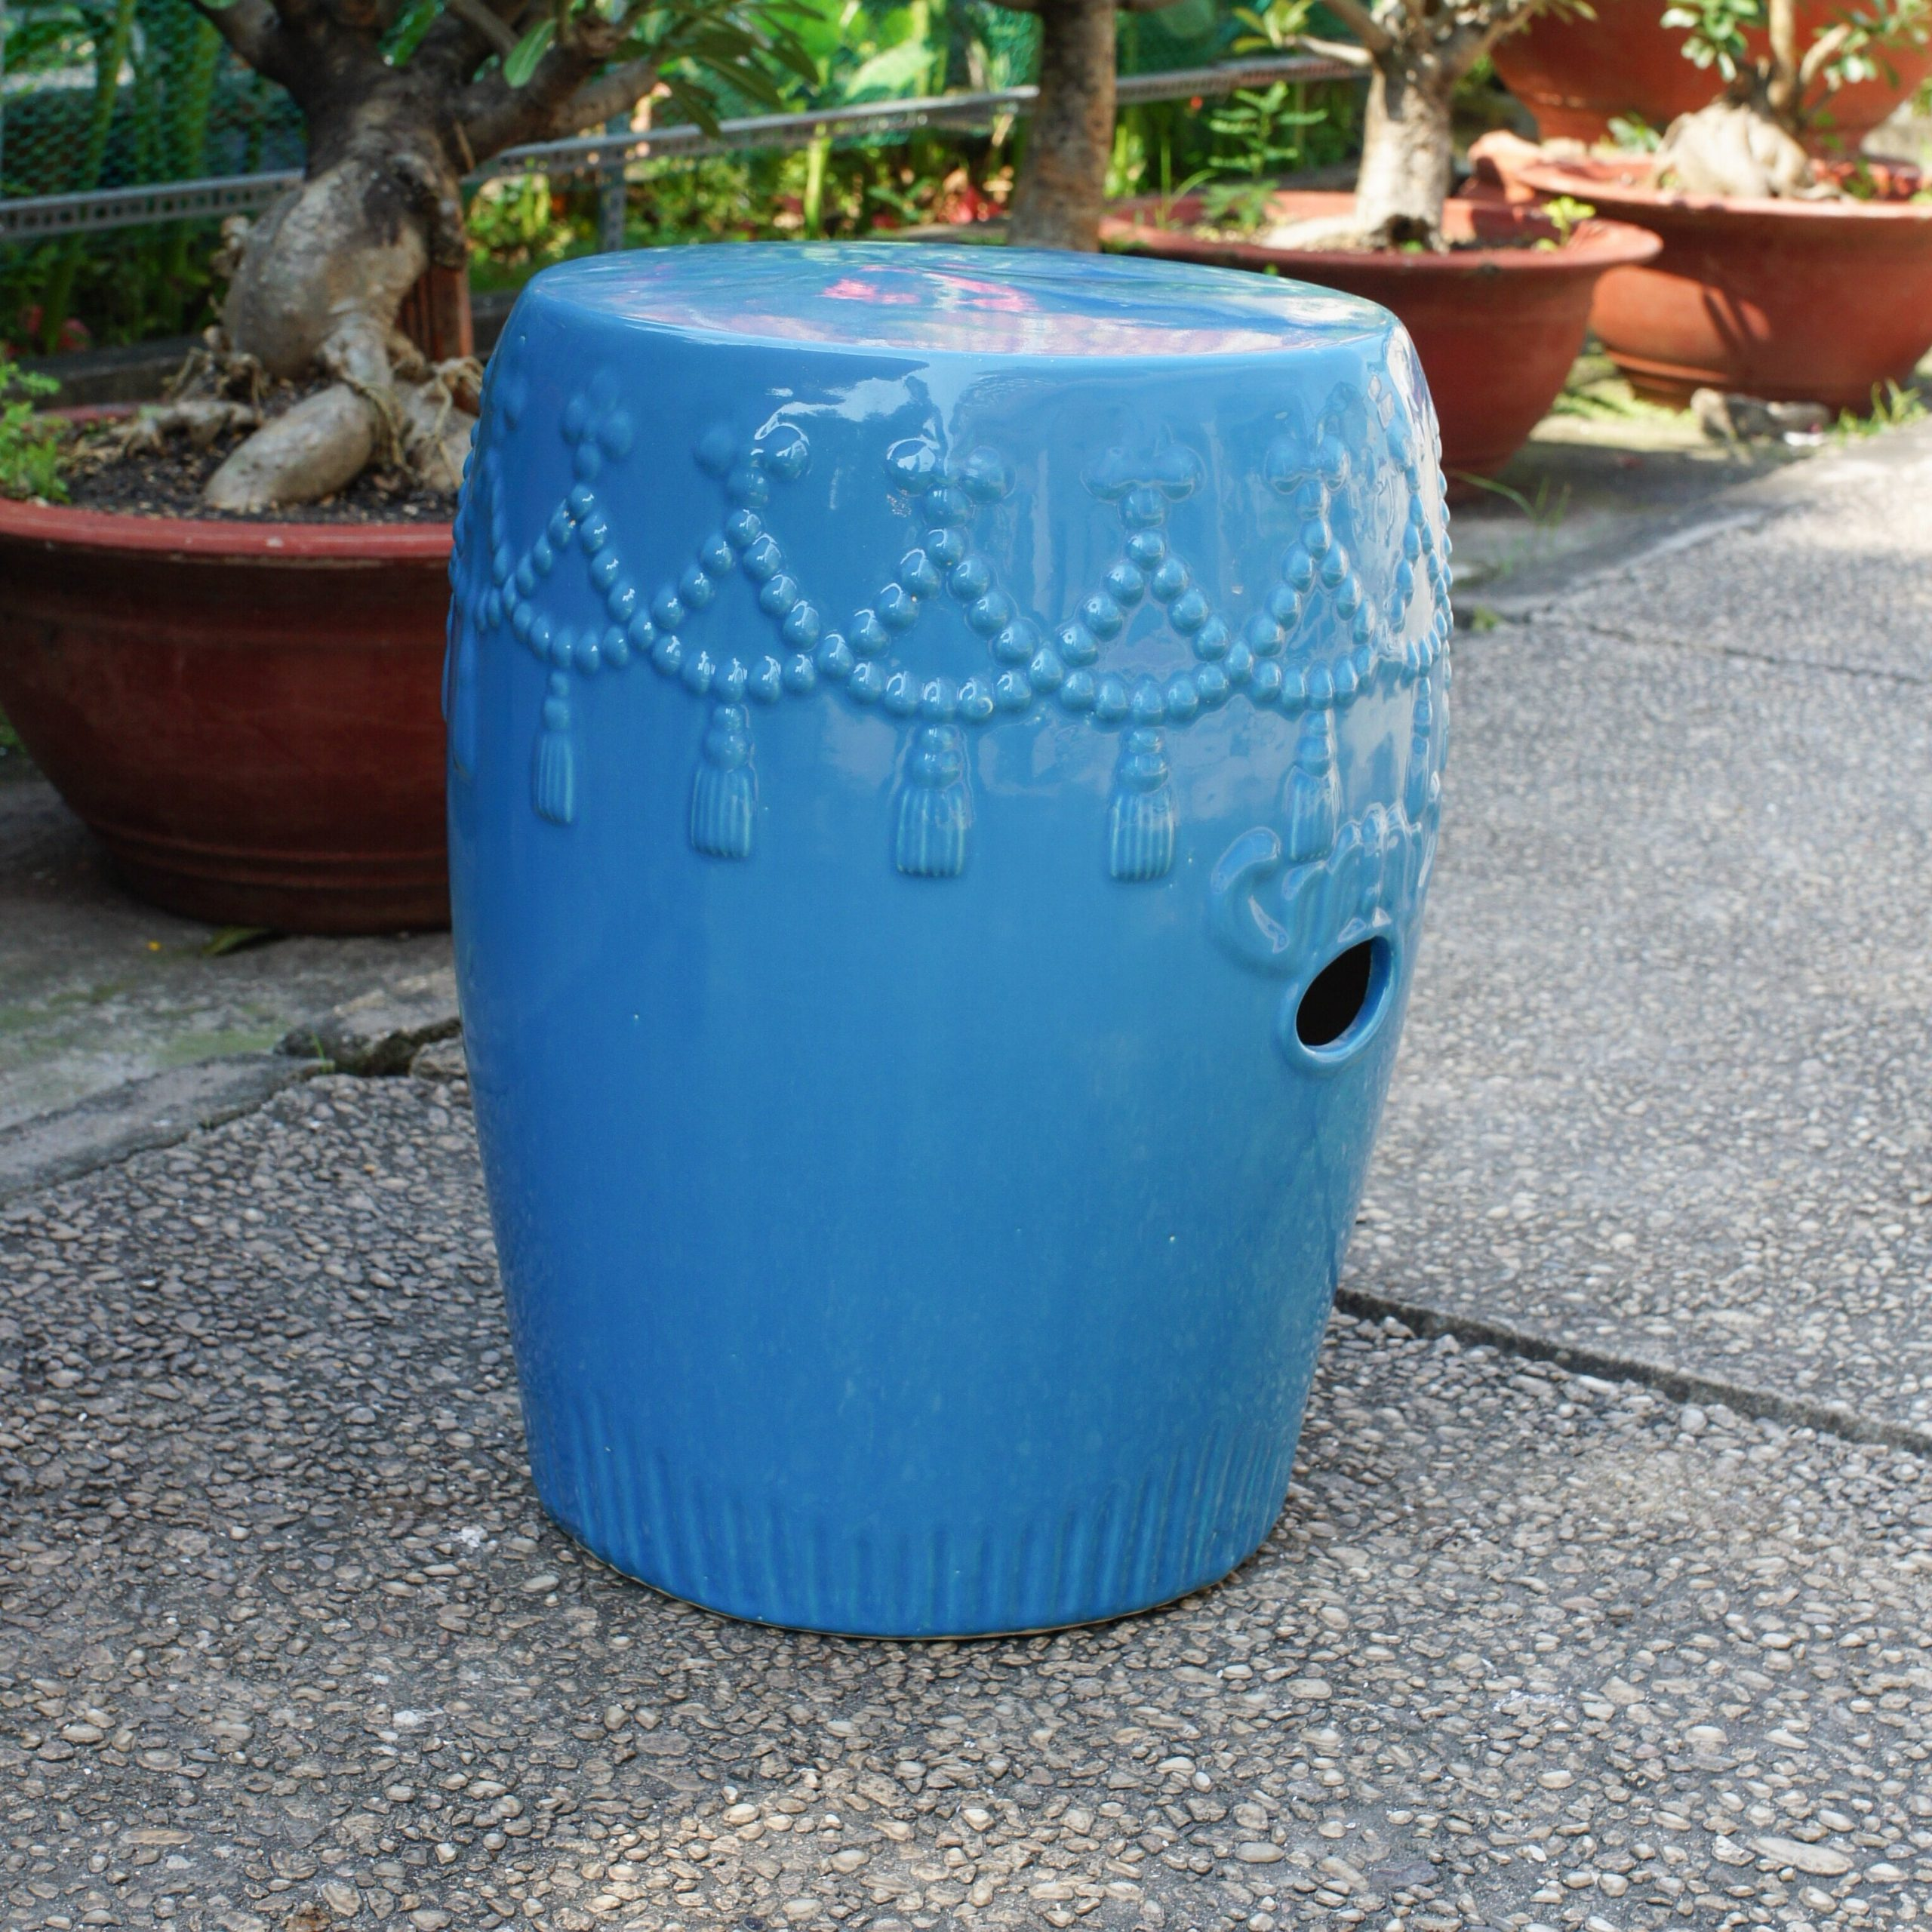 Alonsa Drum Ceramic Garden Stool Pertaining To Oakside Ceramic Garden Stools (View 8 of 25)